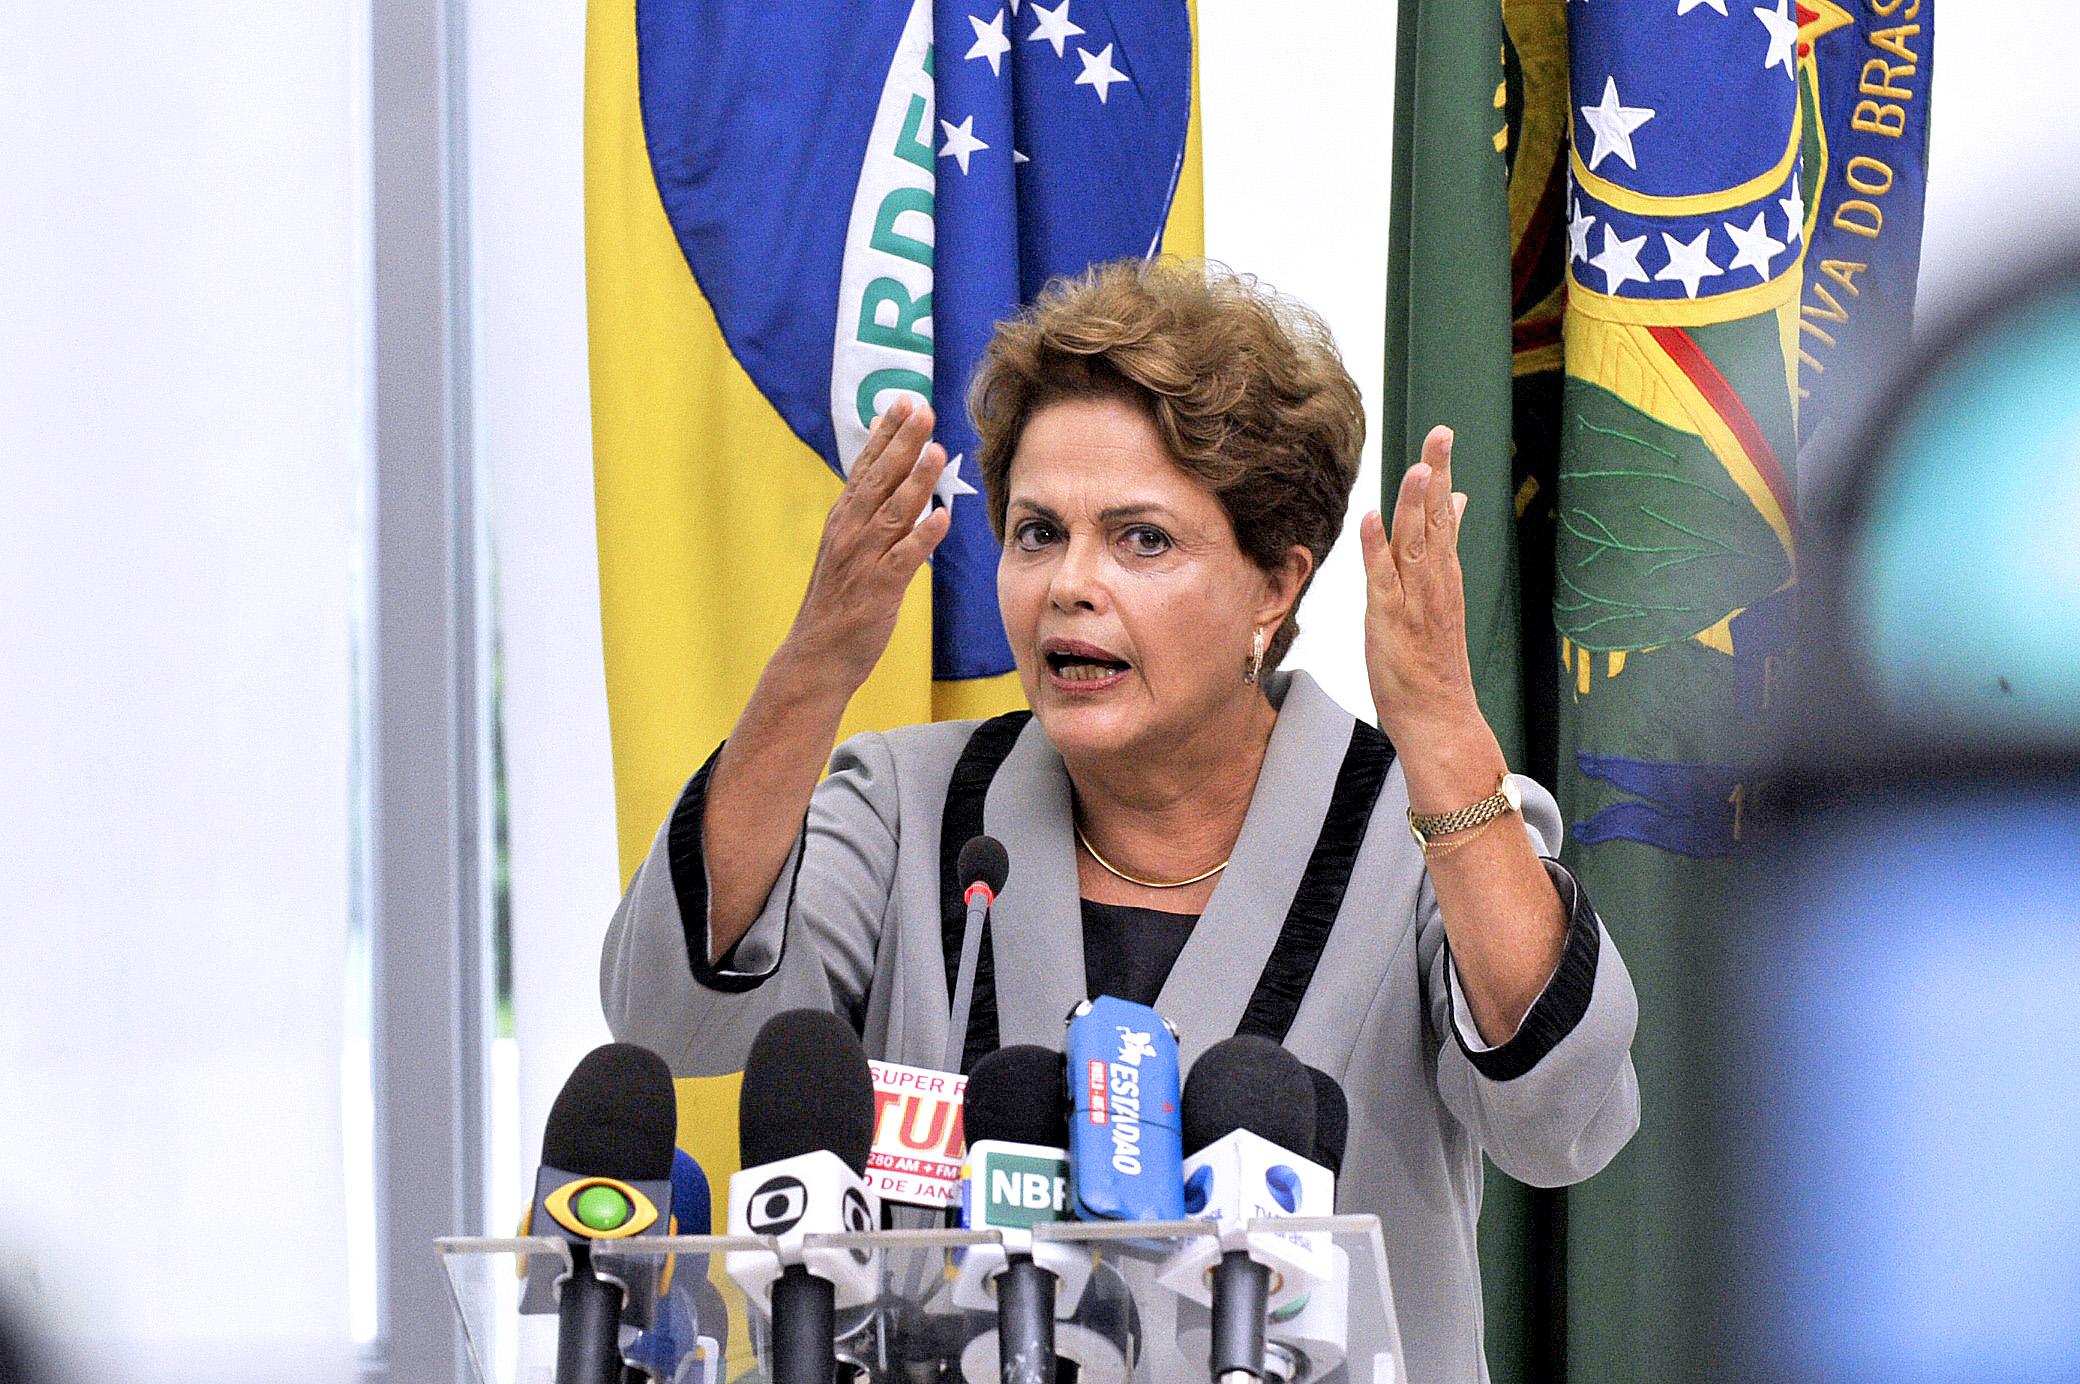 A presidente da República Dilma Rousseff concede entrevista coletiva no Palácio do Planalto. Foto: Jonas Pereira/Agência Senado